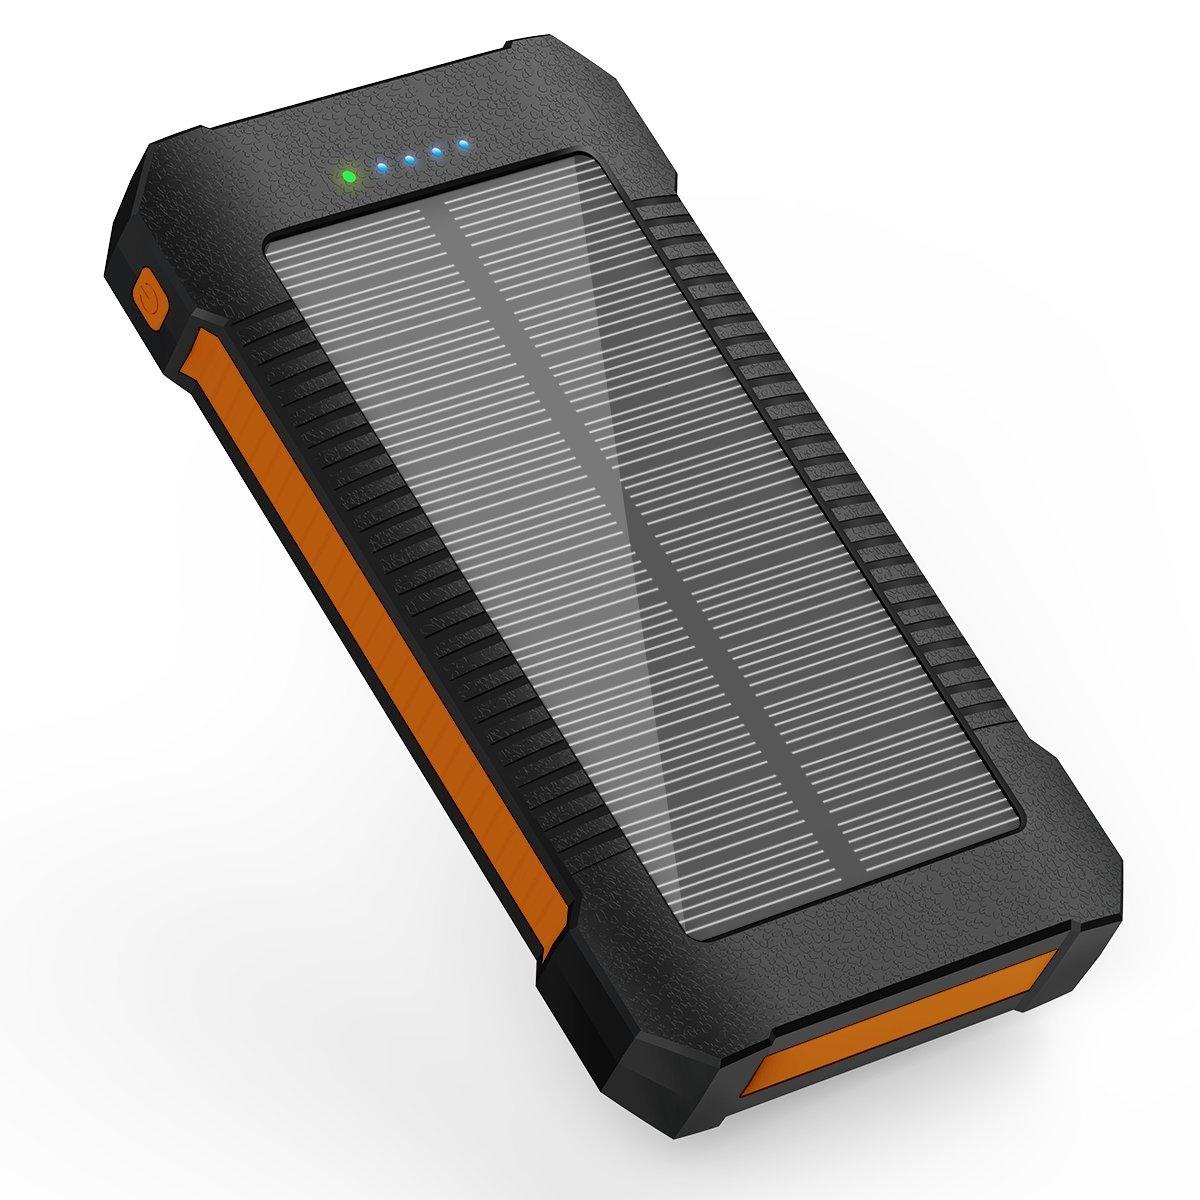 Solar Ladegerät Power Bank 22000mAh, tragbares Solar Handy Ladegerät Solar Panel externer Akku Ladegerät mit Dual USB, der U89, LED Taschenlampe, IPX7Wasserdicht, stoßfest und staubdicht, für Handy, iPhone, Samsung Galaxy, iPad, Kamera, B